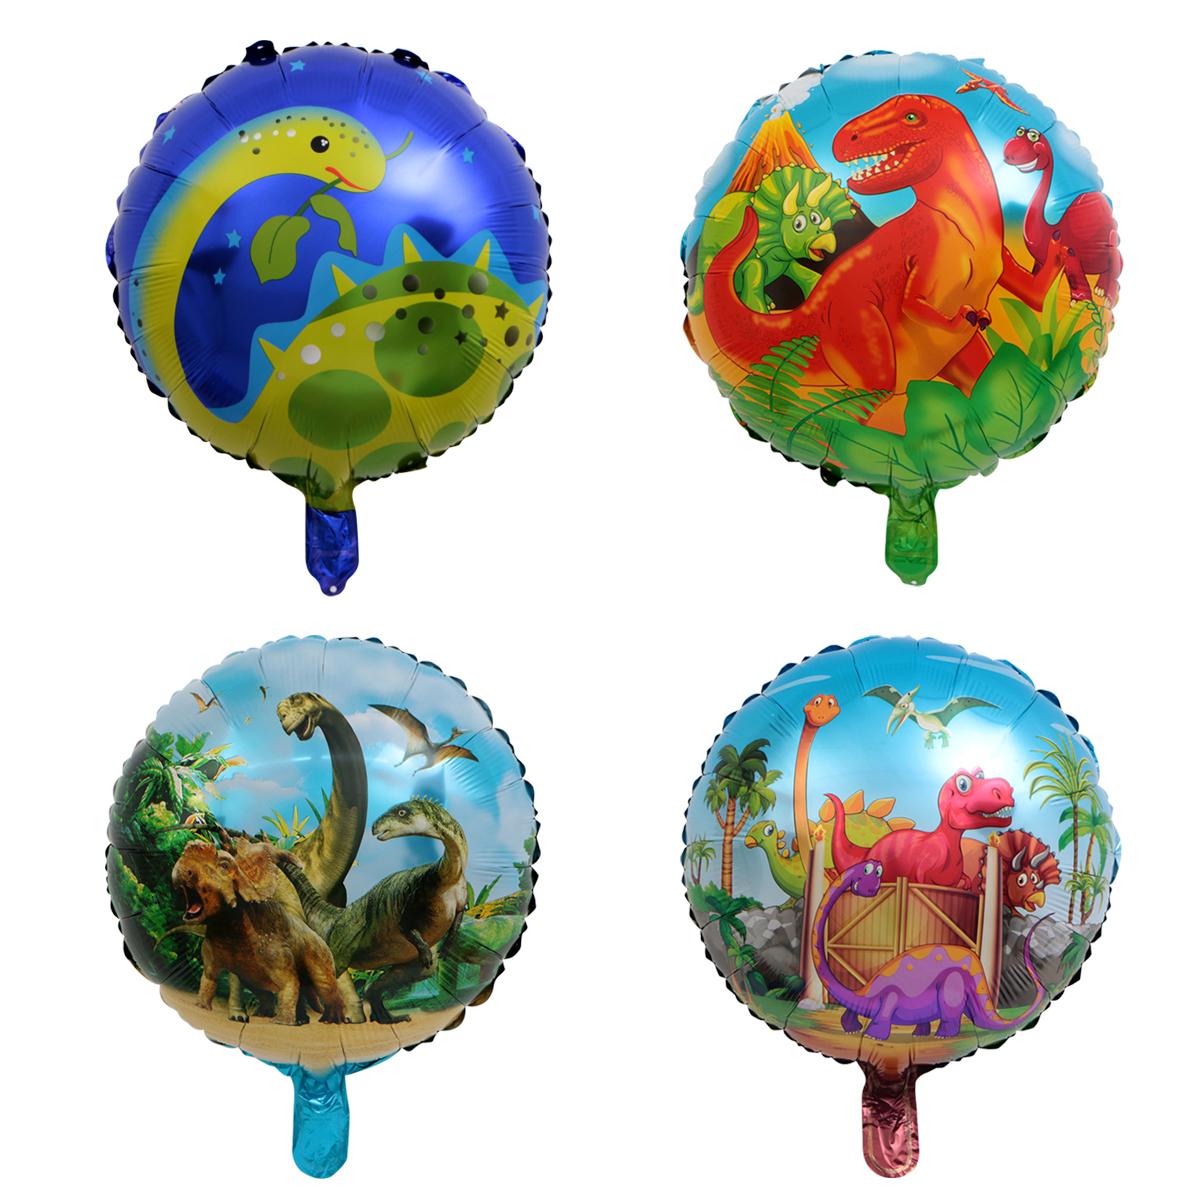 Boys Toy Wedding Party Inflatable Air Balloons Decor Dinosaur Foil Balloons